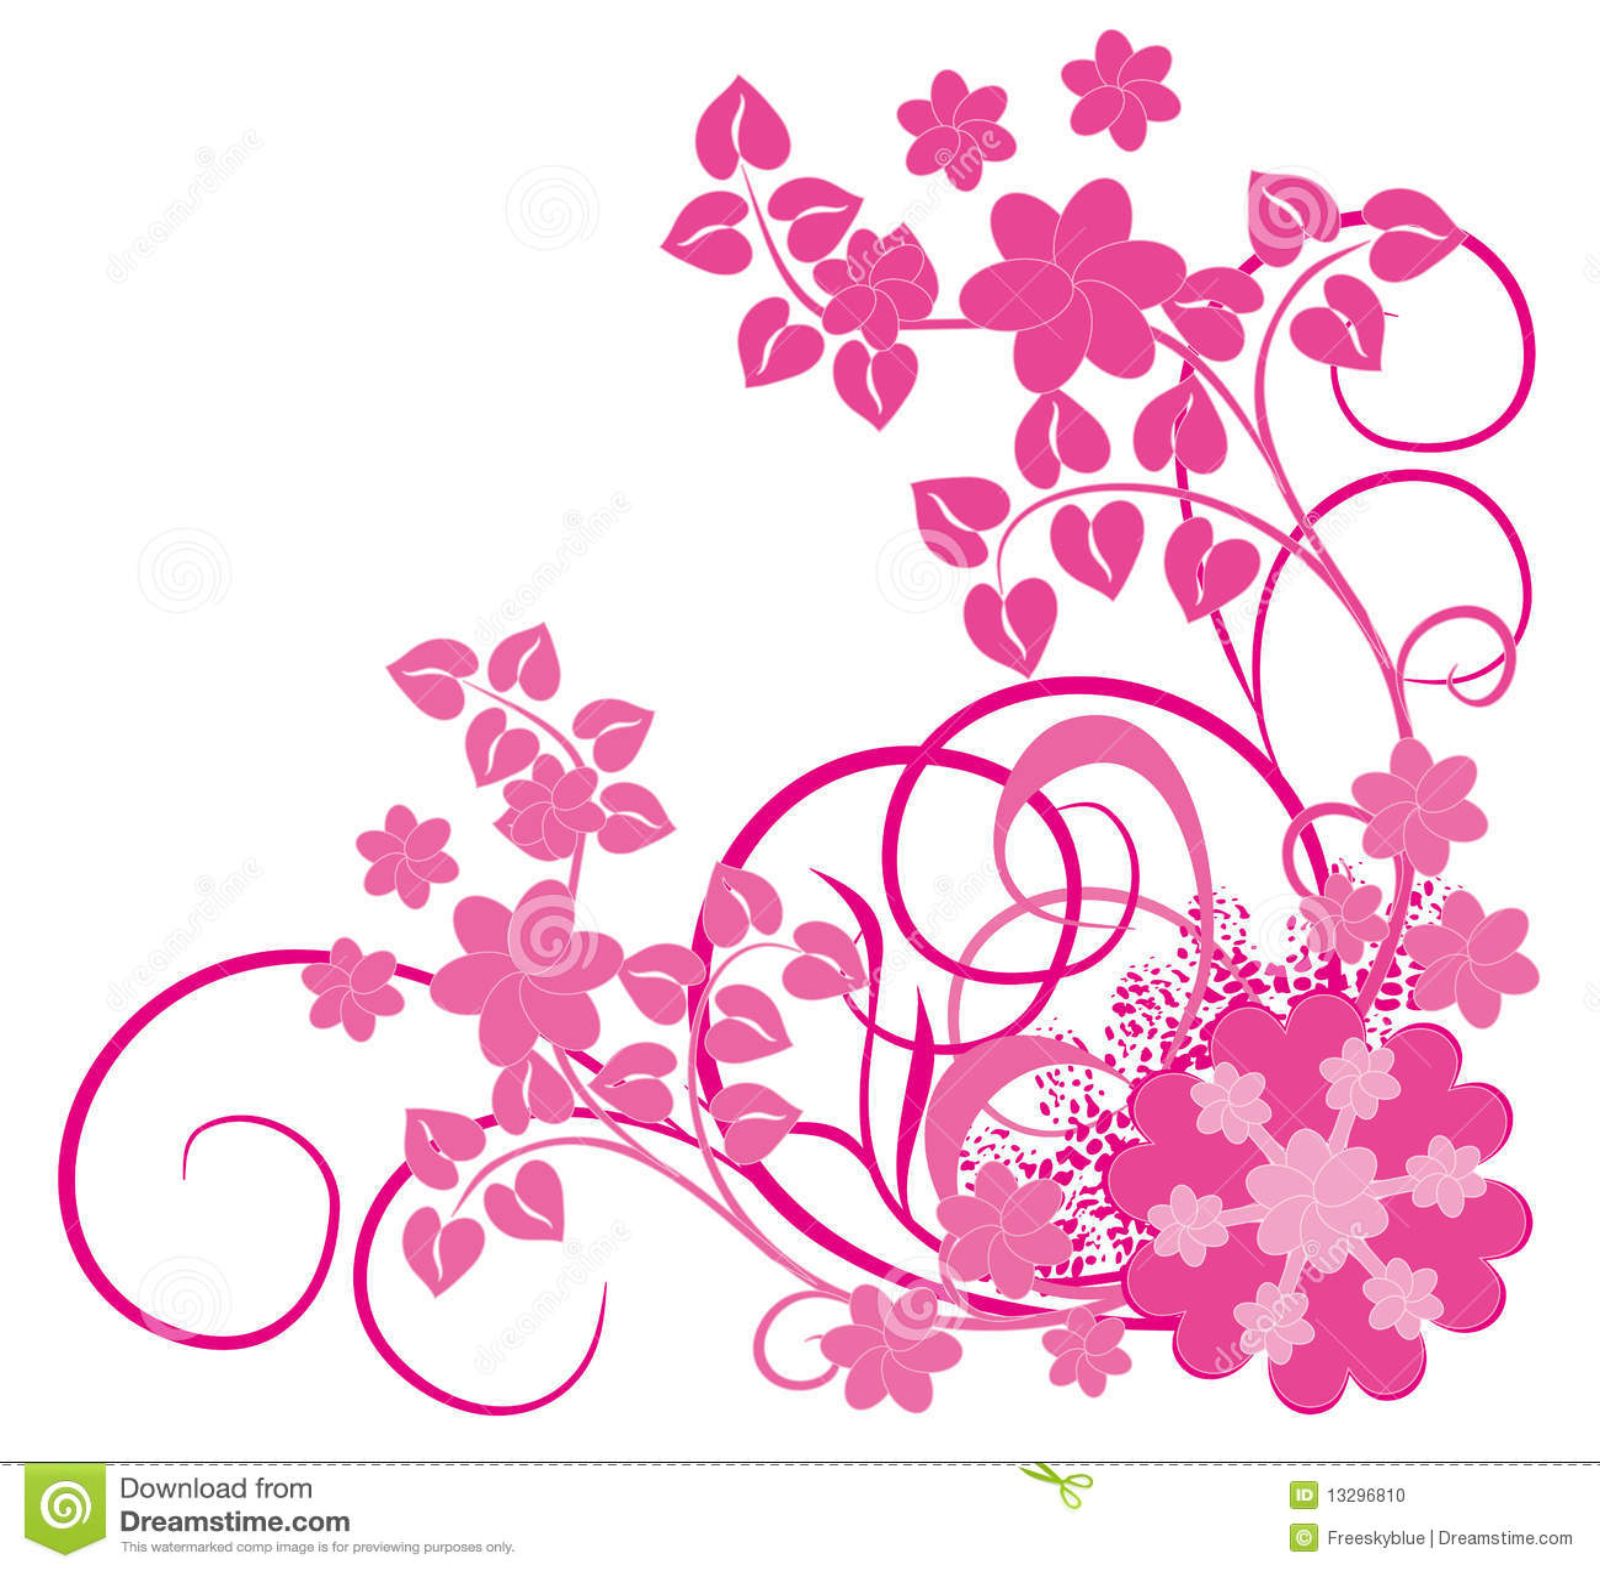 Pink Flower Vines Stock Illustrations 318 Pink Flower Vines Stock